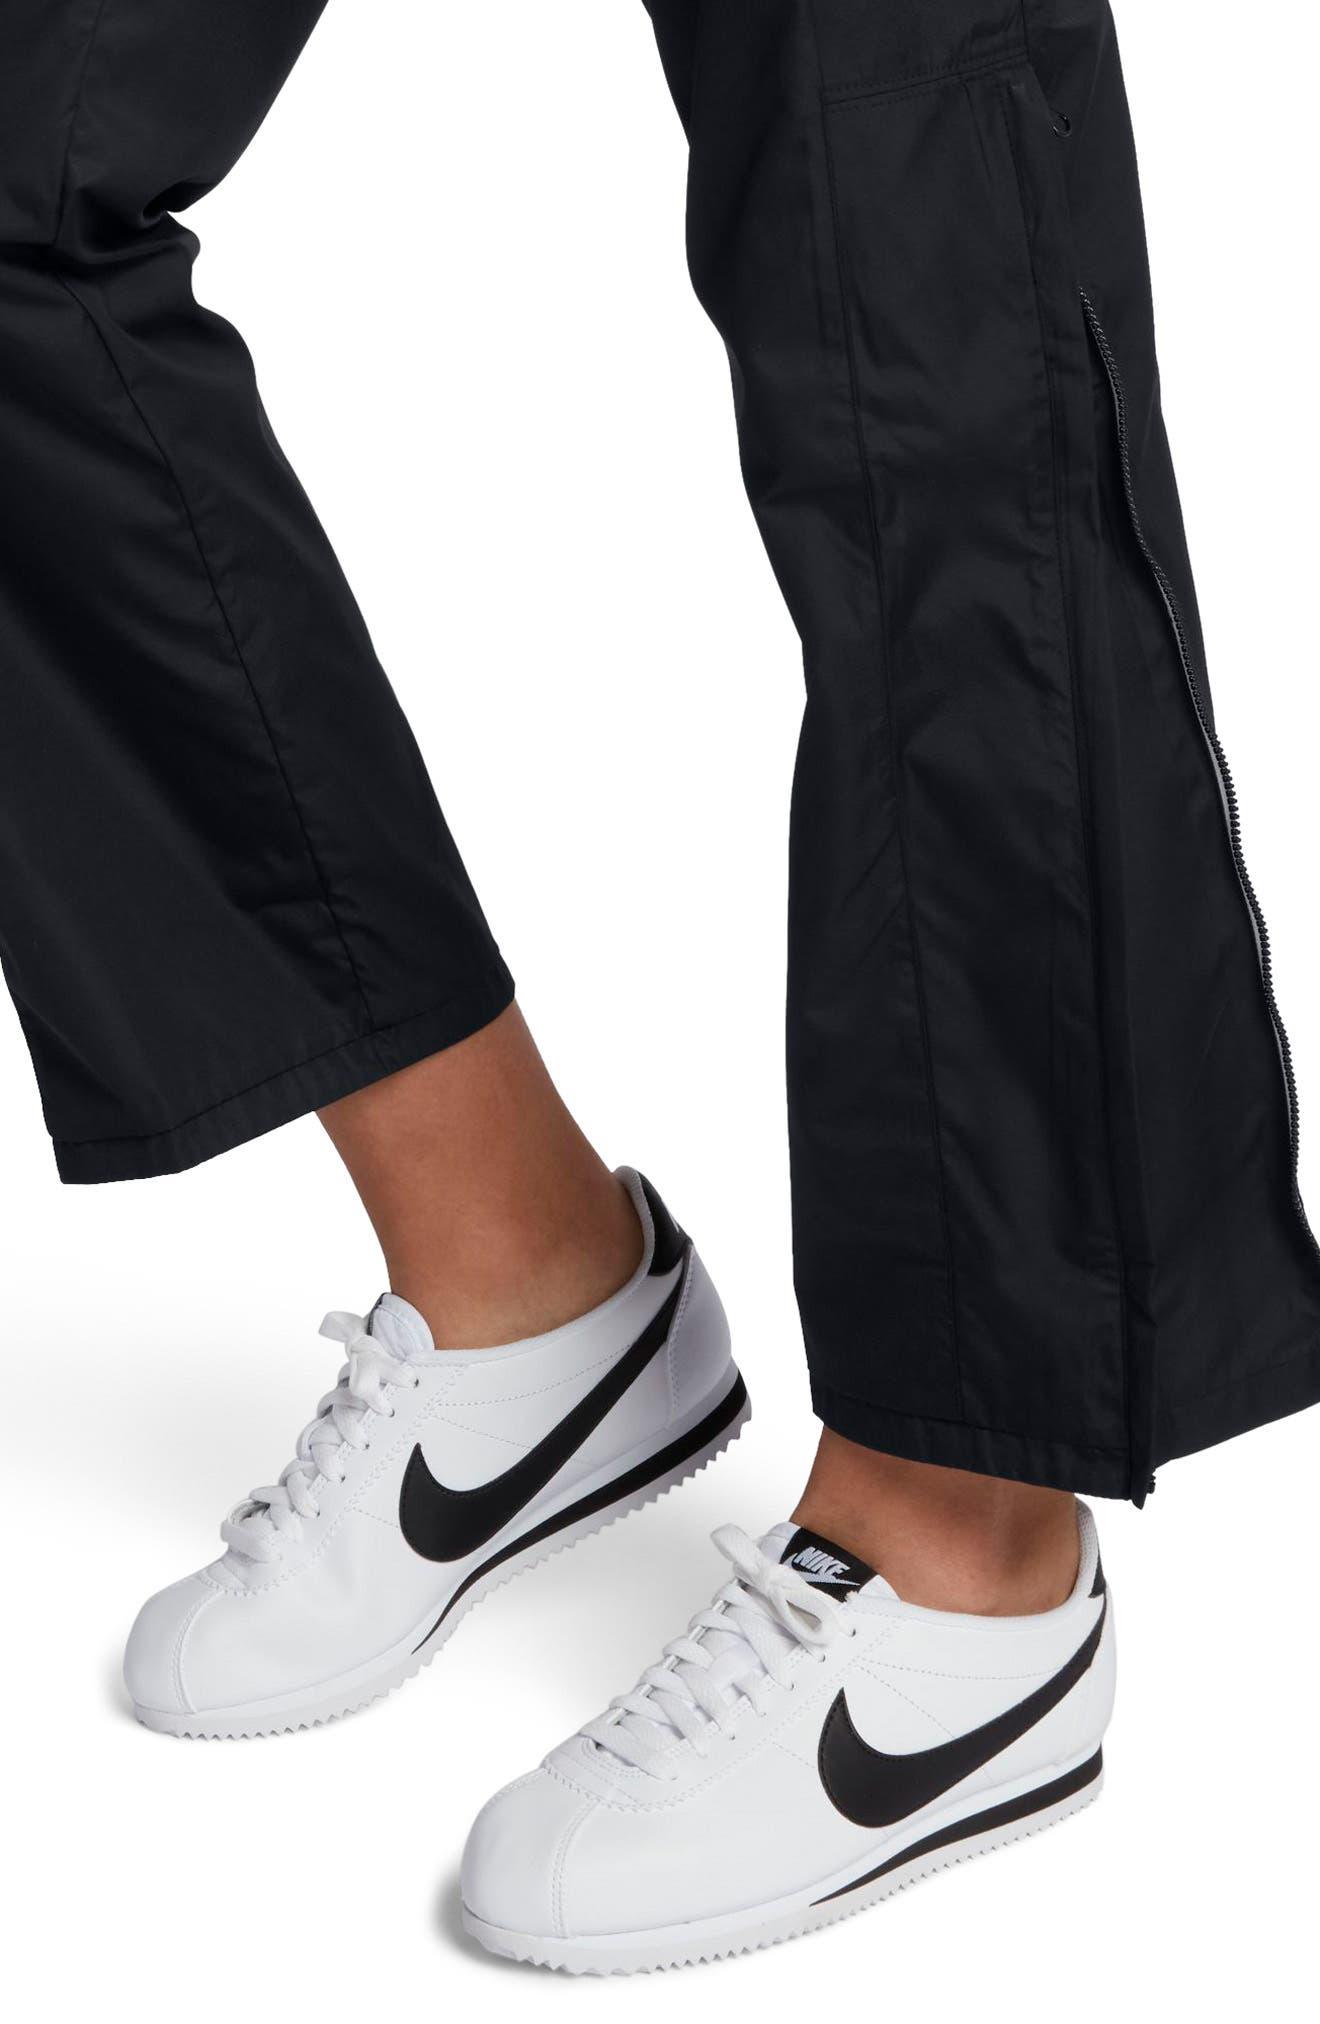 Sportswear Women's Stretch Faille Pants,                             Alternate thumbnail 4, color,                             Black